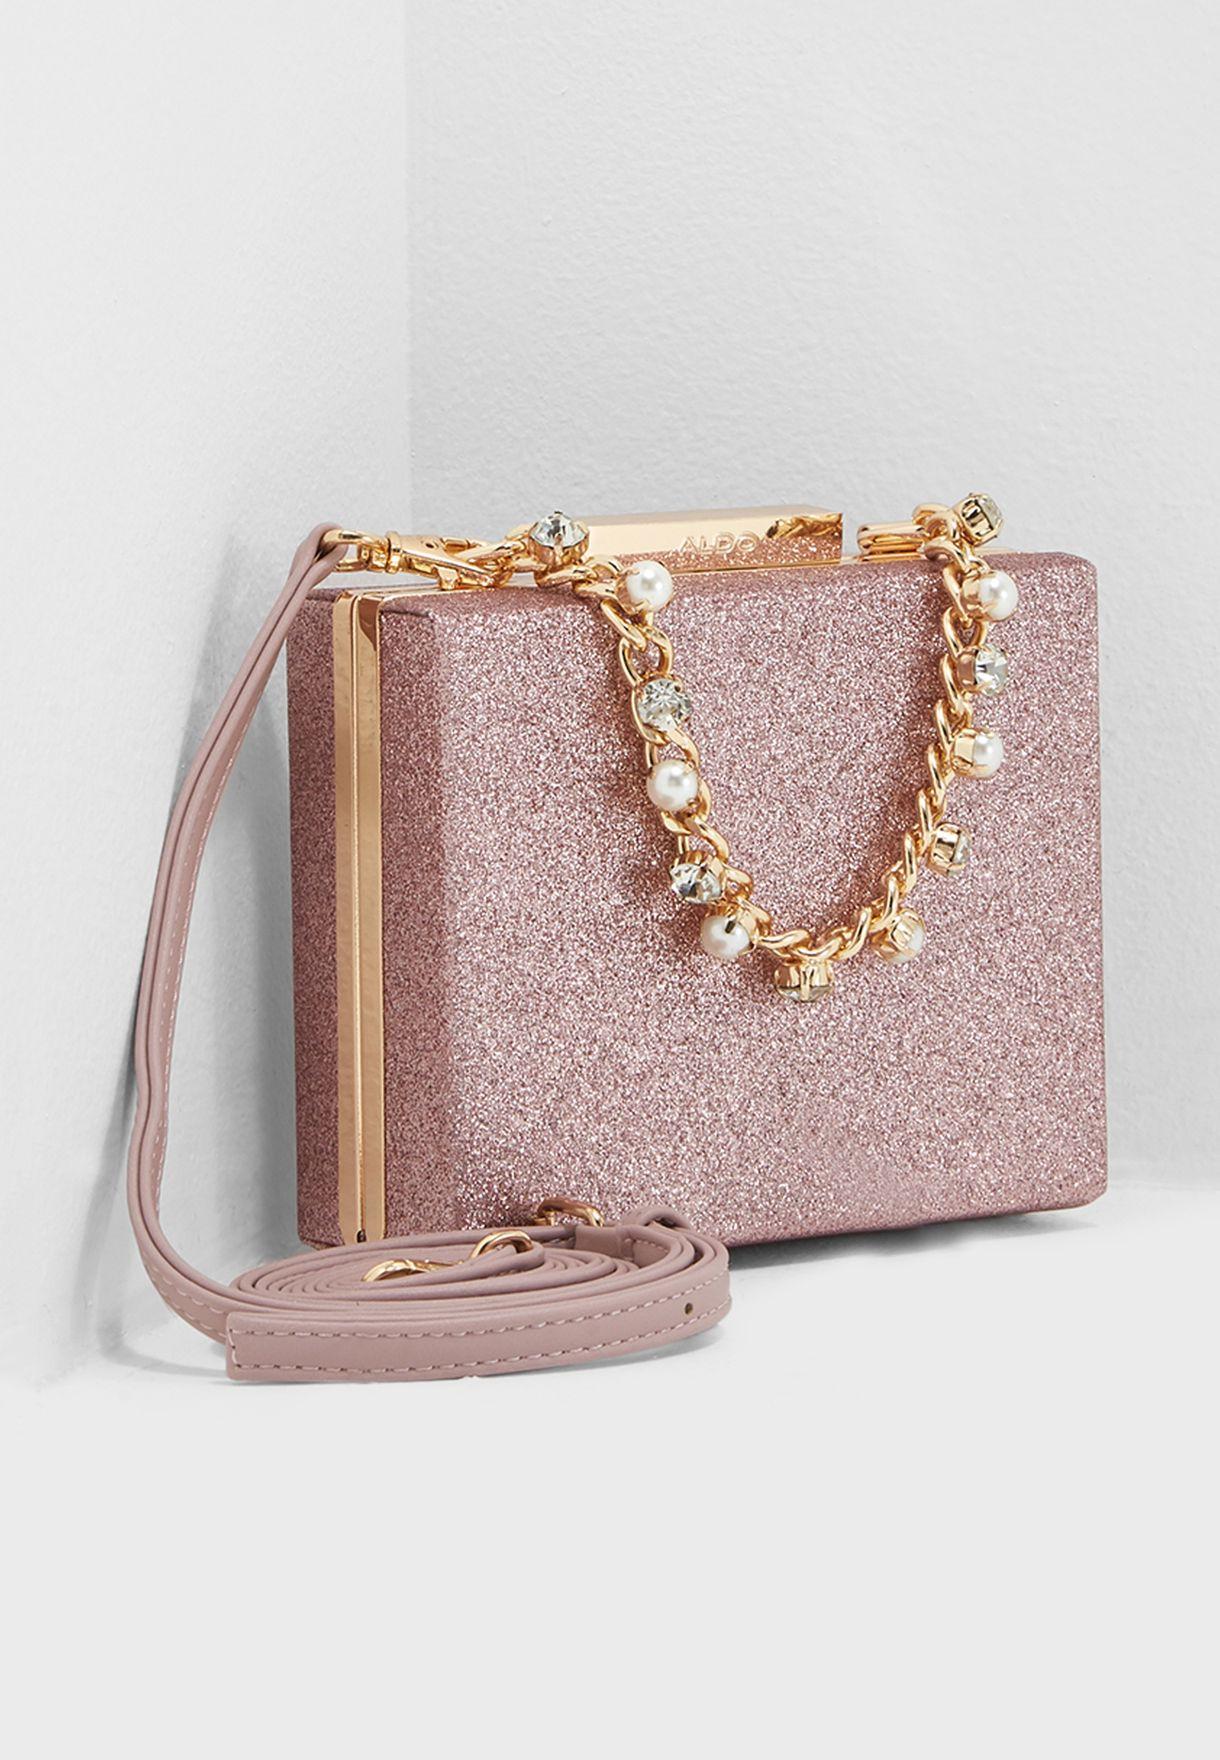 bacf8f61d1bd Shop Aldo pink Horipewell Clutch HORIPEWELL55 for Women in UAE ...